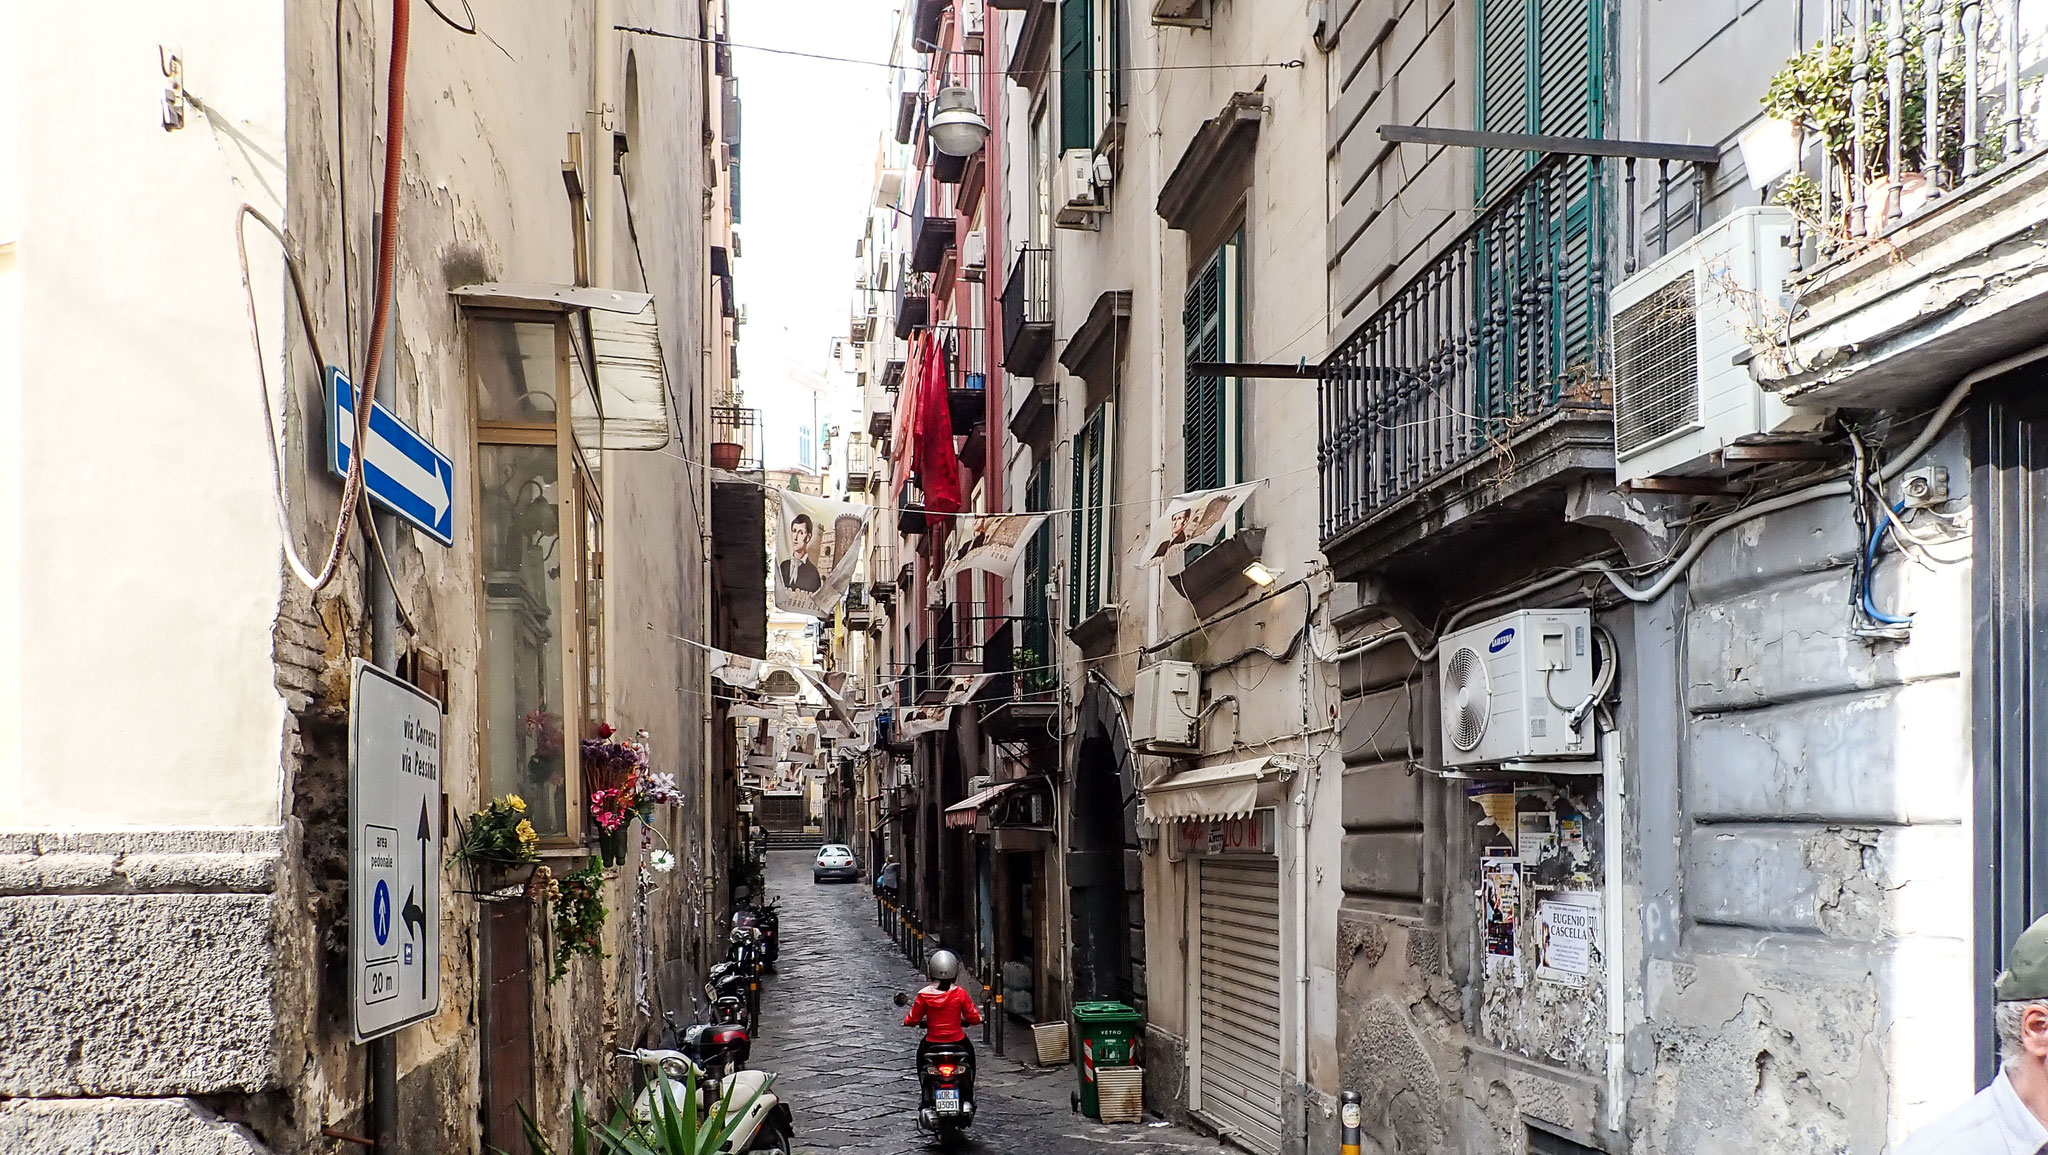 Quartier Spagniola